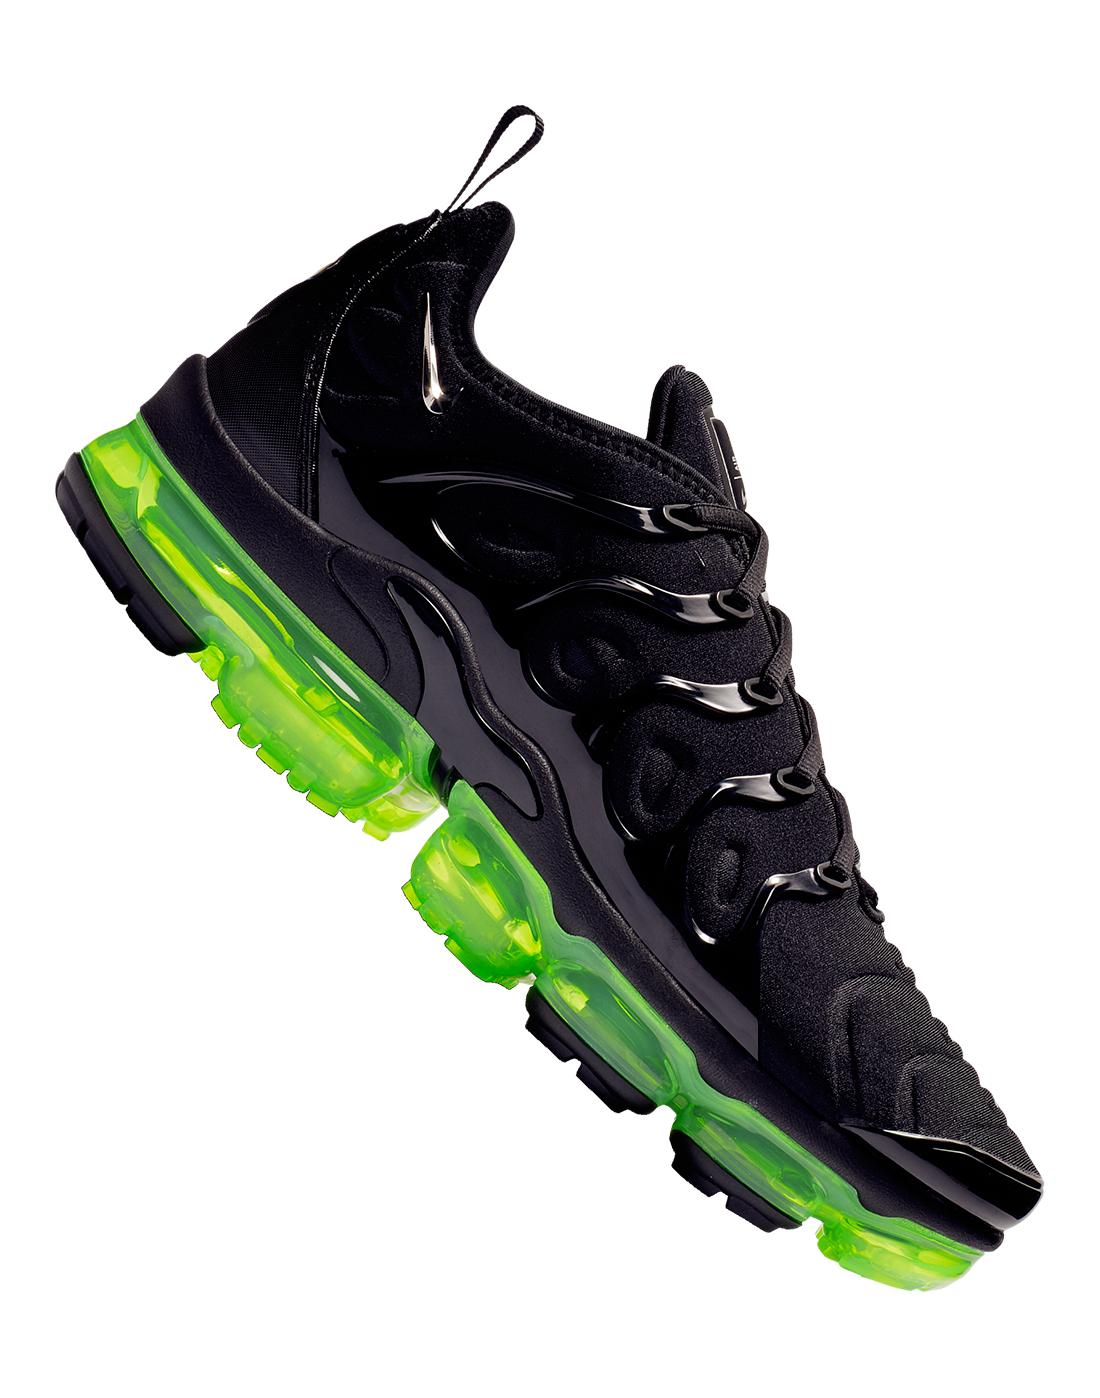 9145dc9ab0 Men's Black & Neon Green Nike Vapormax Plus | Life Style Sports